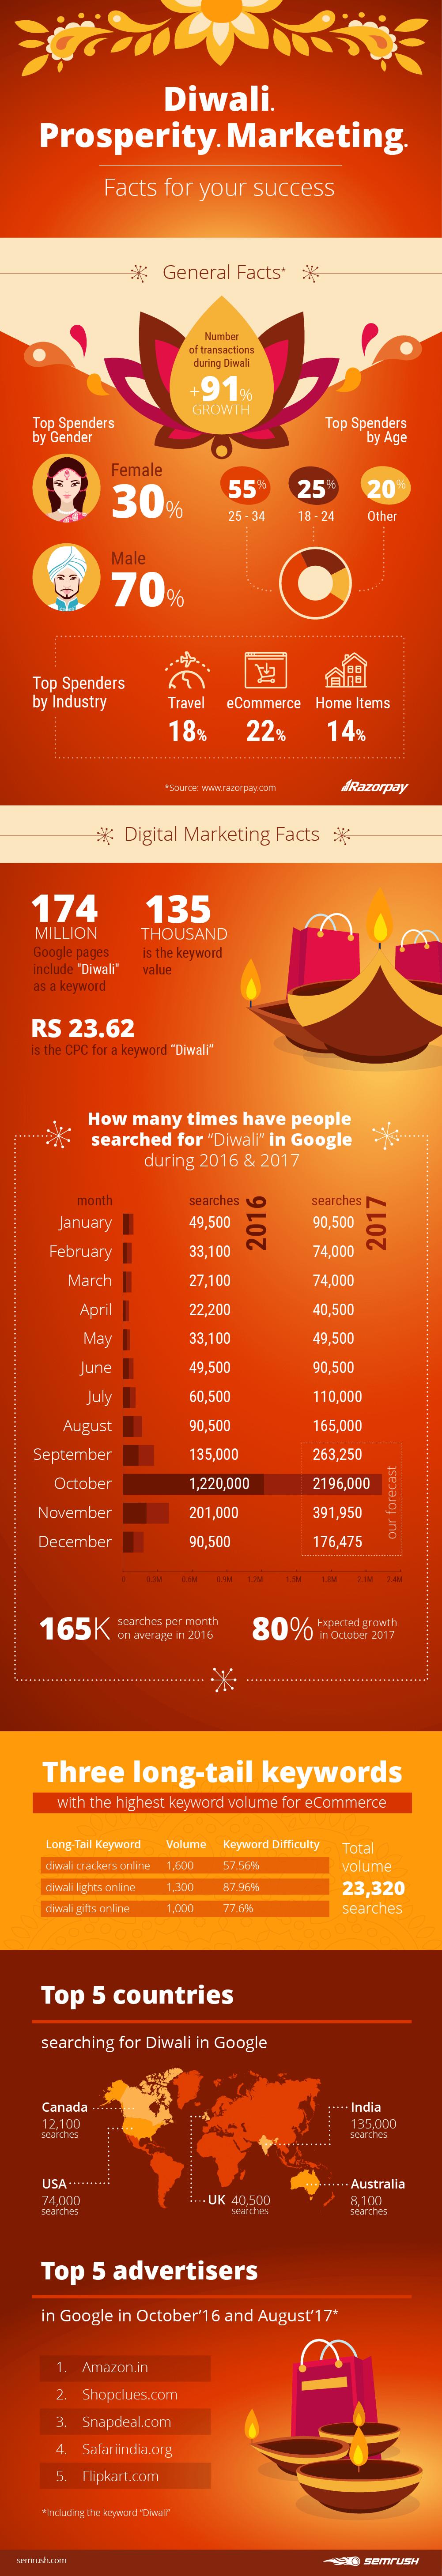 Diwali 2016-17 Study by SEMrush [Infographic]